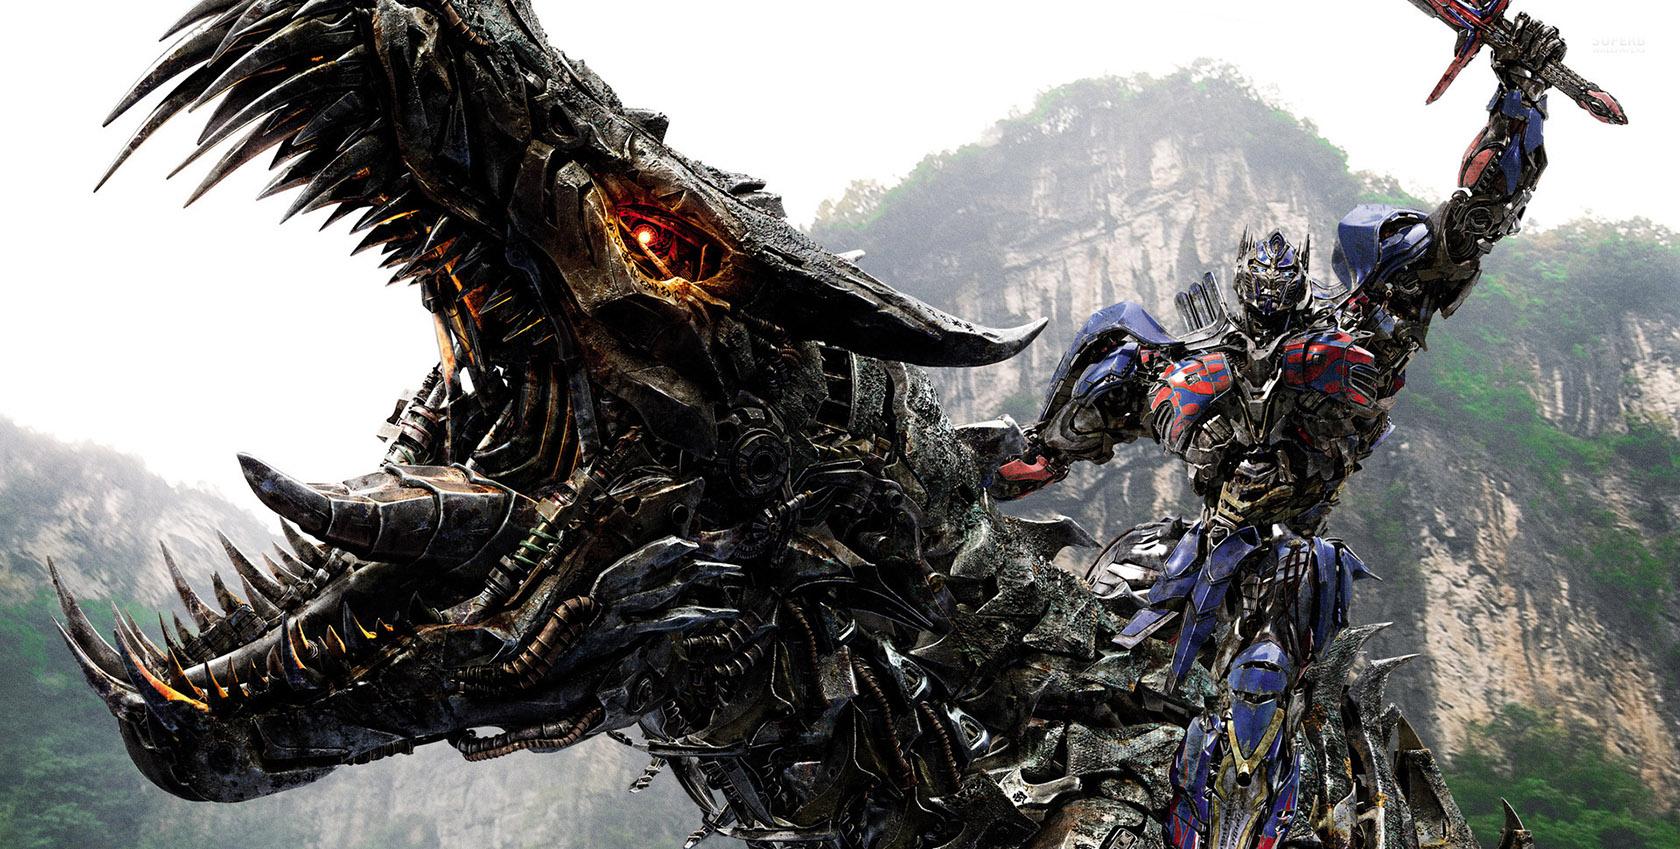 transformers-age-of-extinction-header.jpg